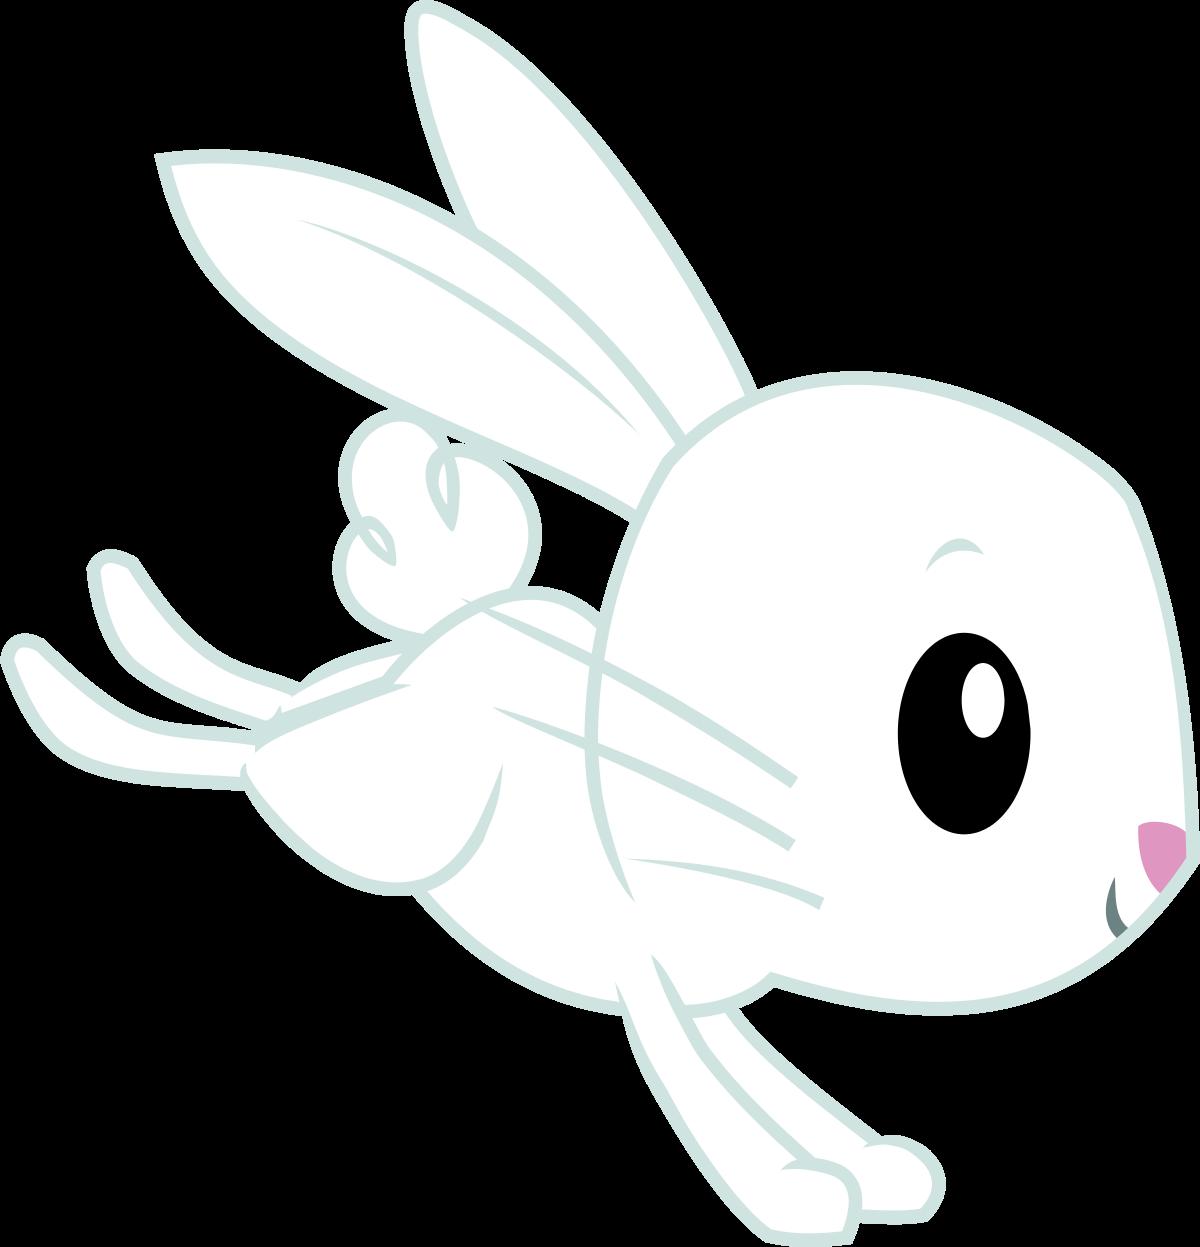 angel_bunny_by_esc54-d6hjxgg.png